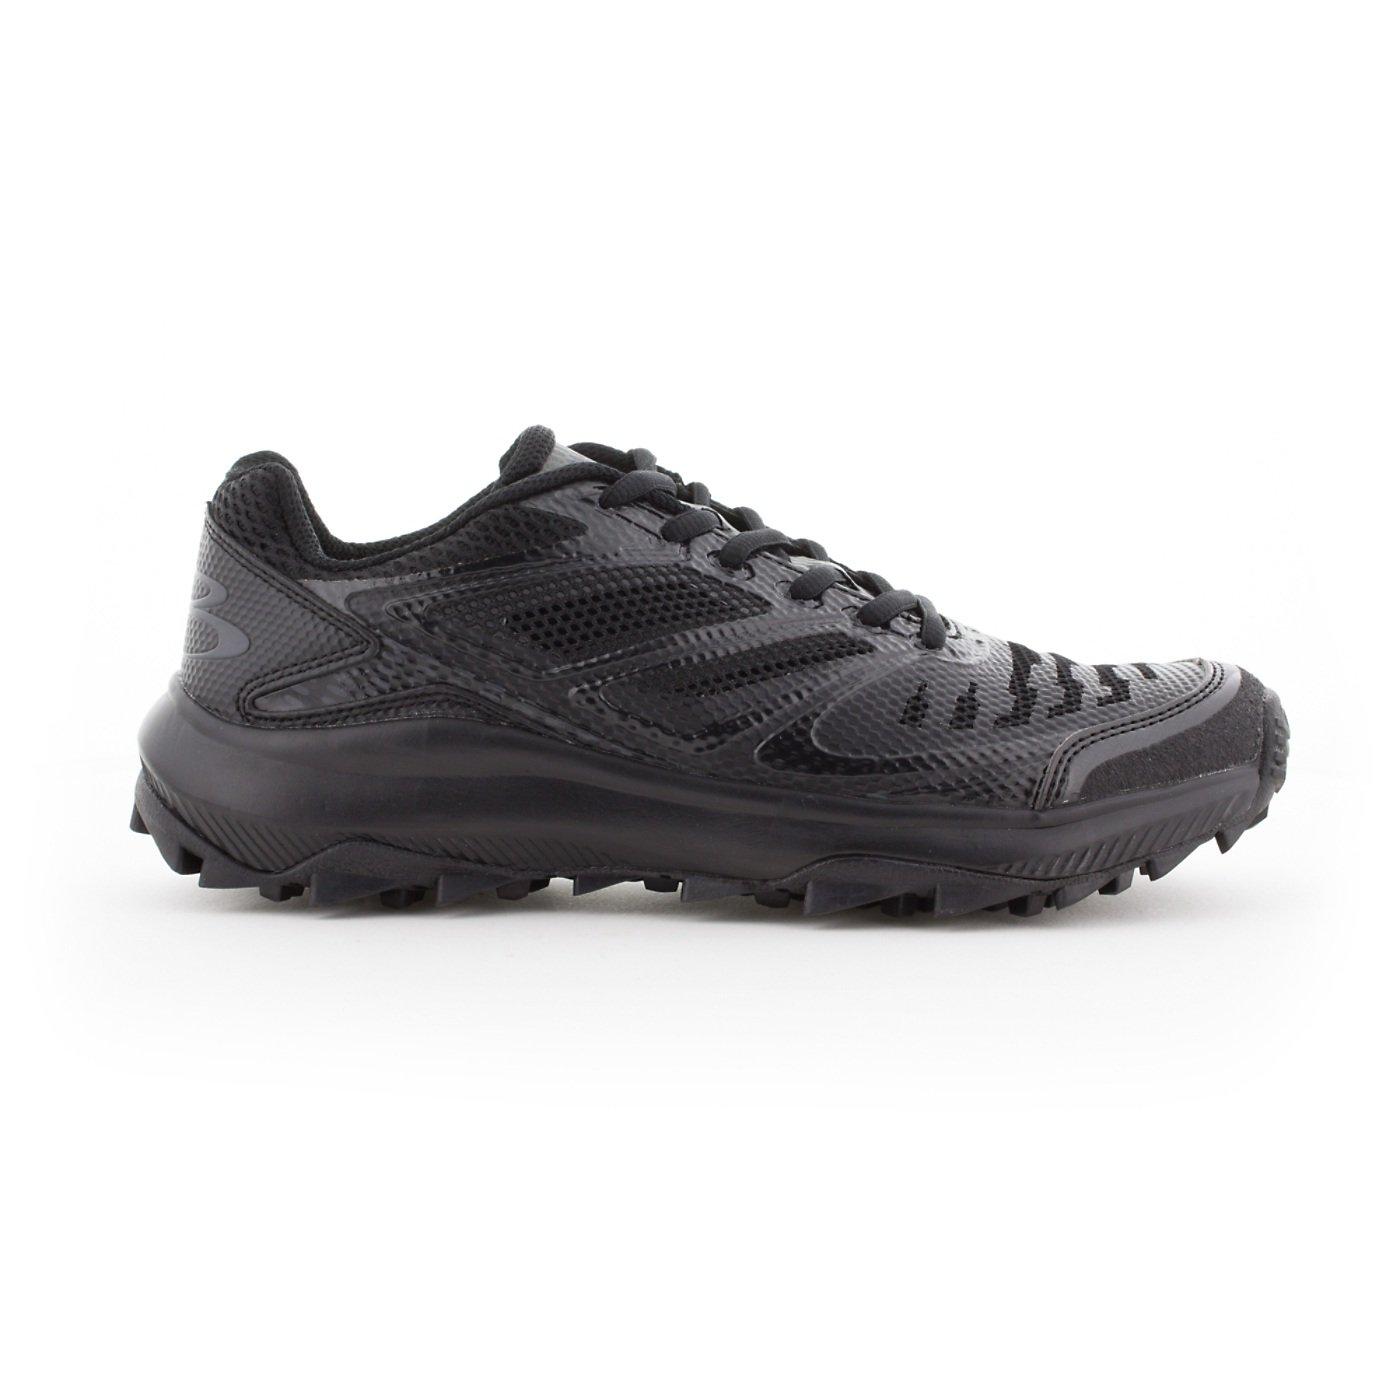 Boombah Men\'s Turbine Turf Shoes - 20 Color Options - Multiple Sizes